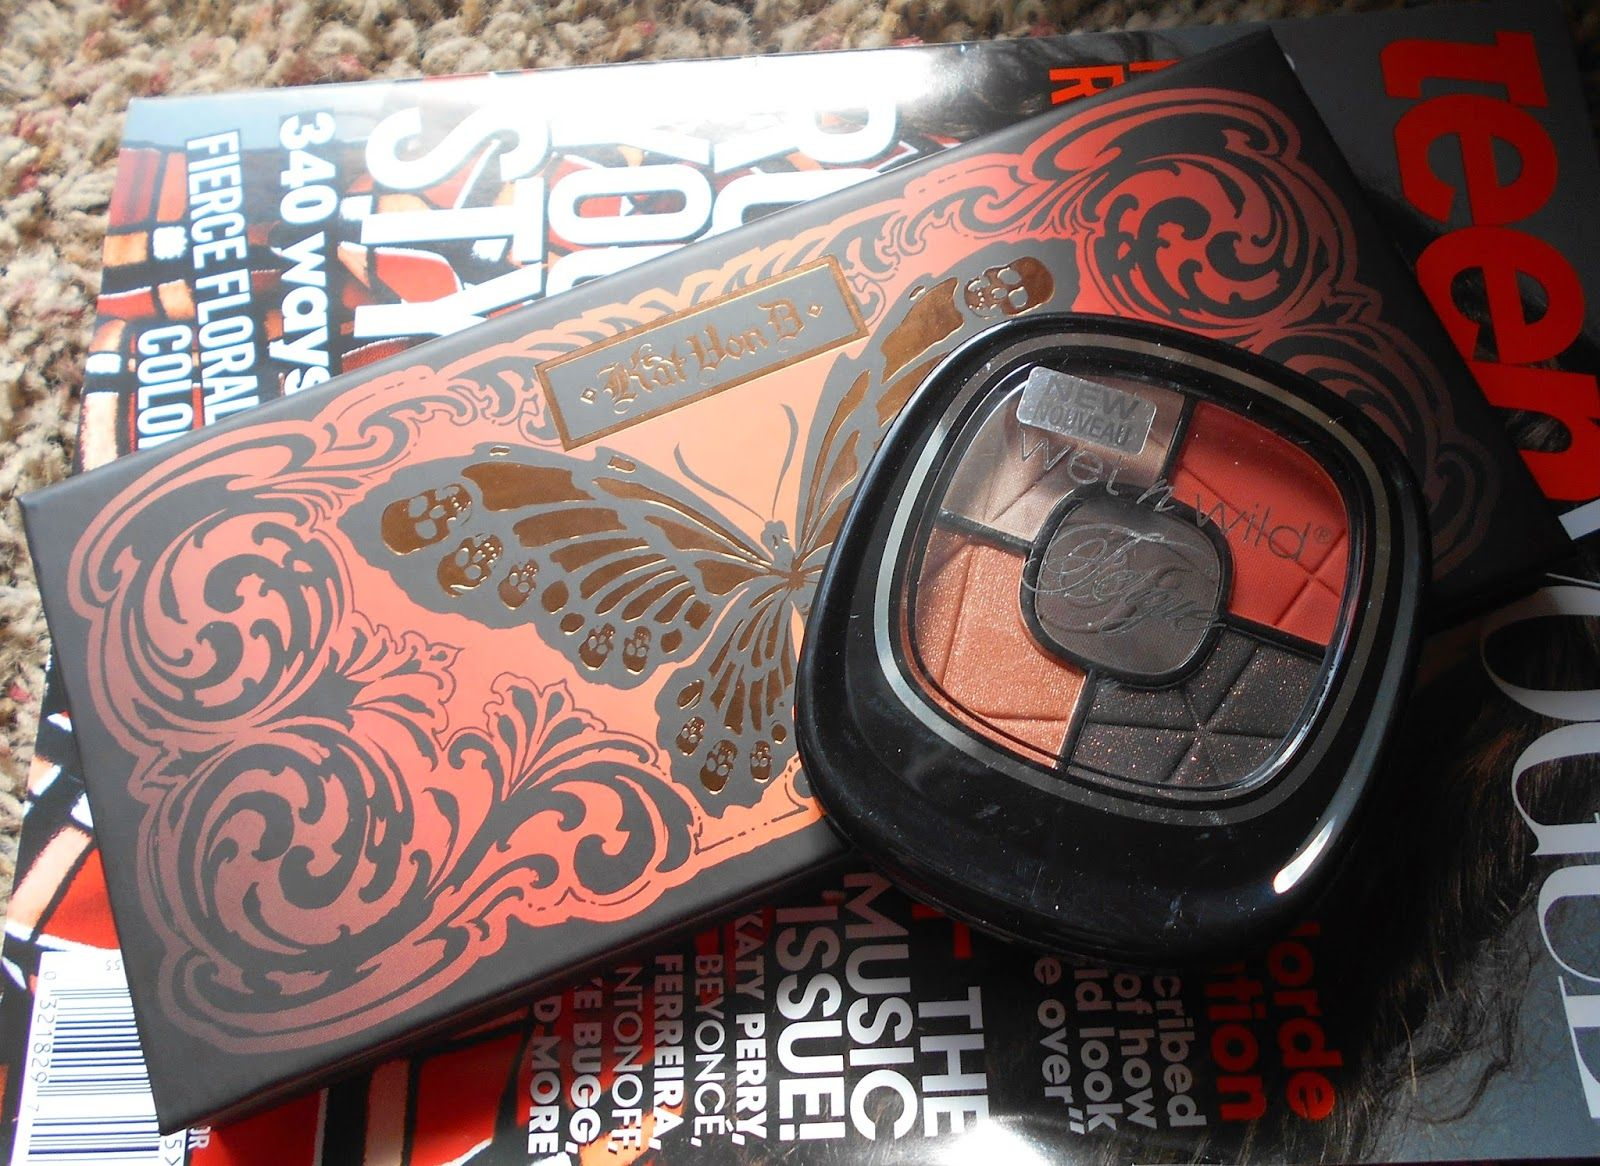 Makeup, Fashion & Royalty: Dupe Alert: Drugstore Version